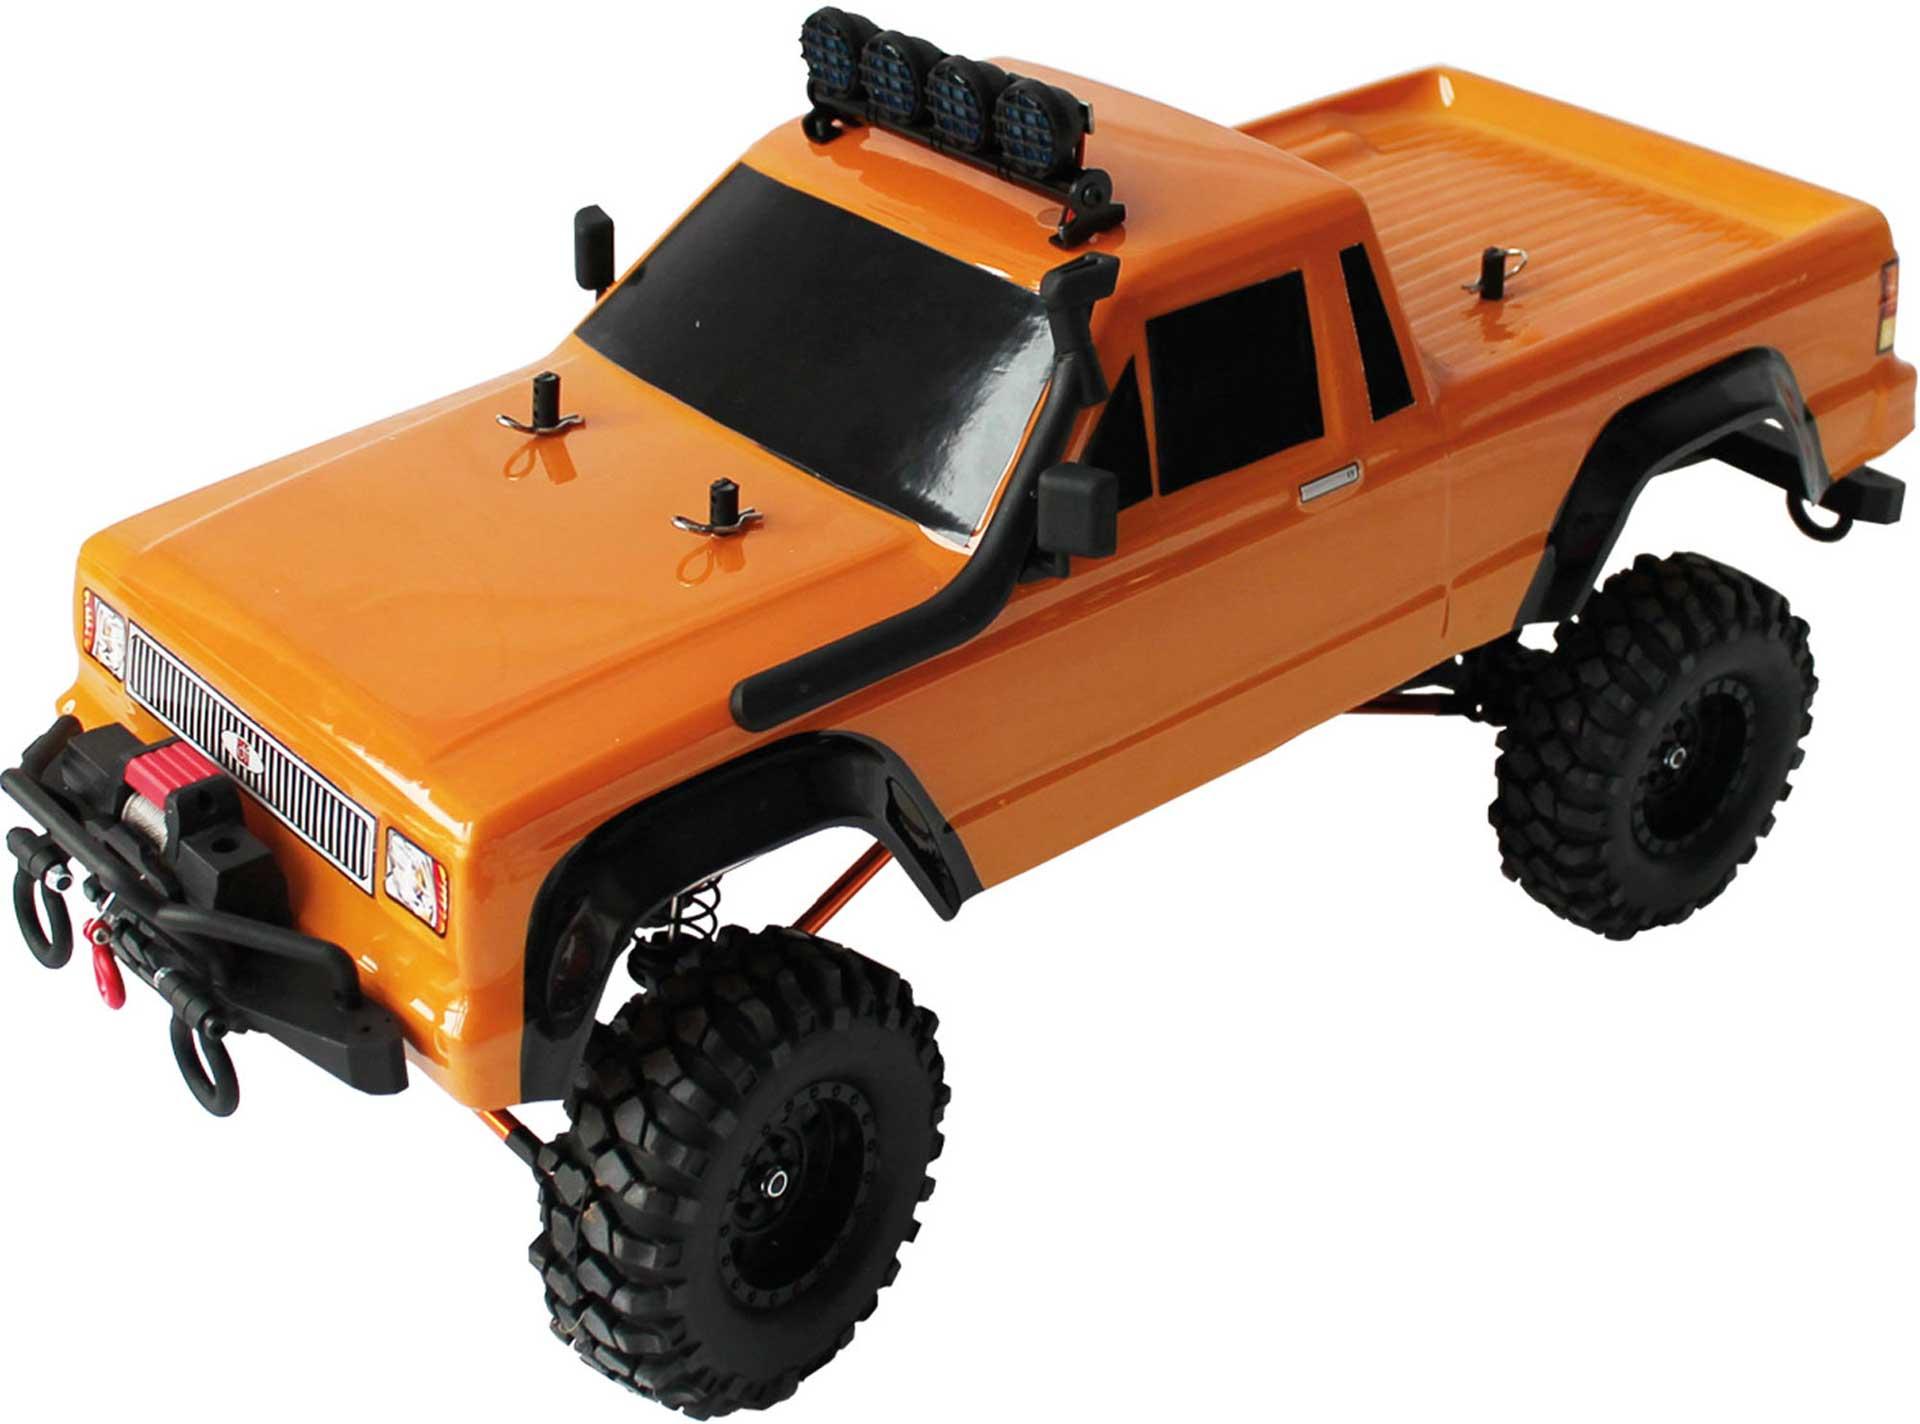 DRIVE & FLY MODELS DF-4S V2 PICK UP CRAWLER ORANGE 1/10 RTR 4WD MIT SEILWINDE UND 2-GANG GETRIEBE